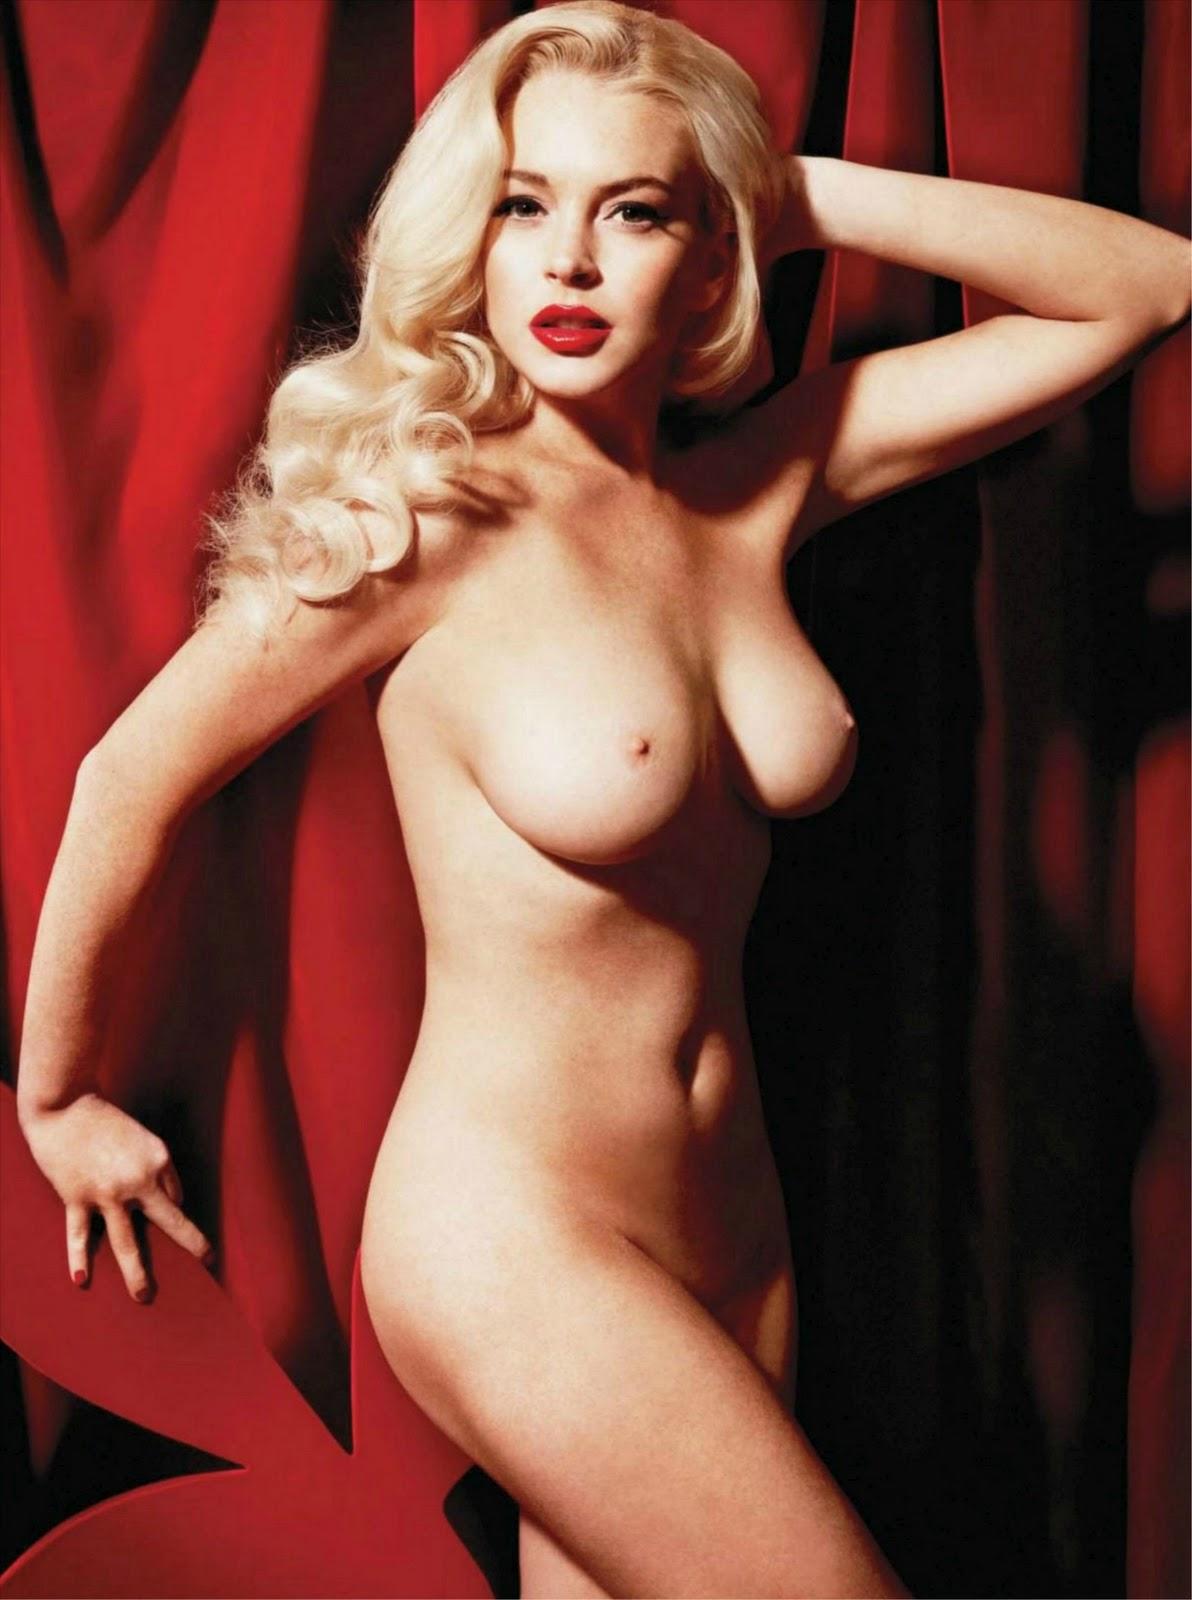 Lindsay Lohan Poses Nude For Playboy Magazine January